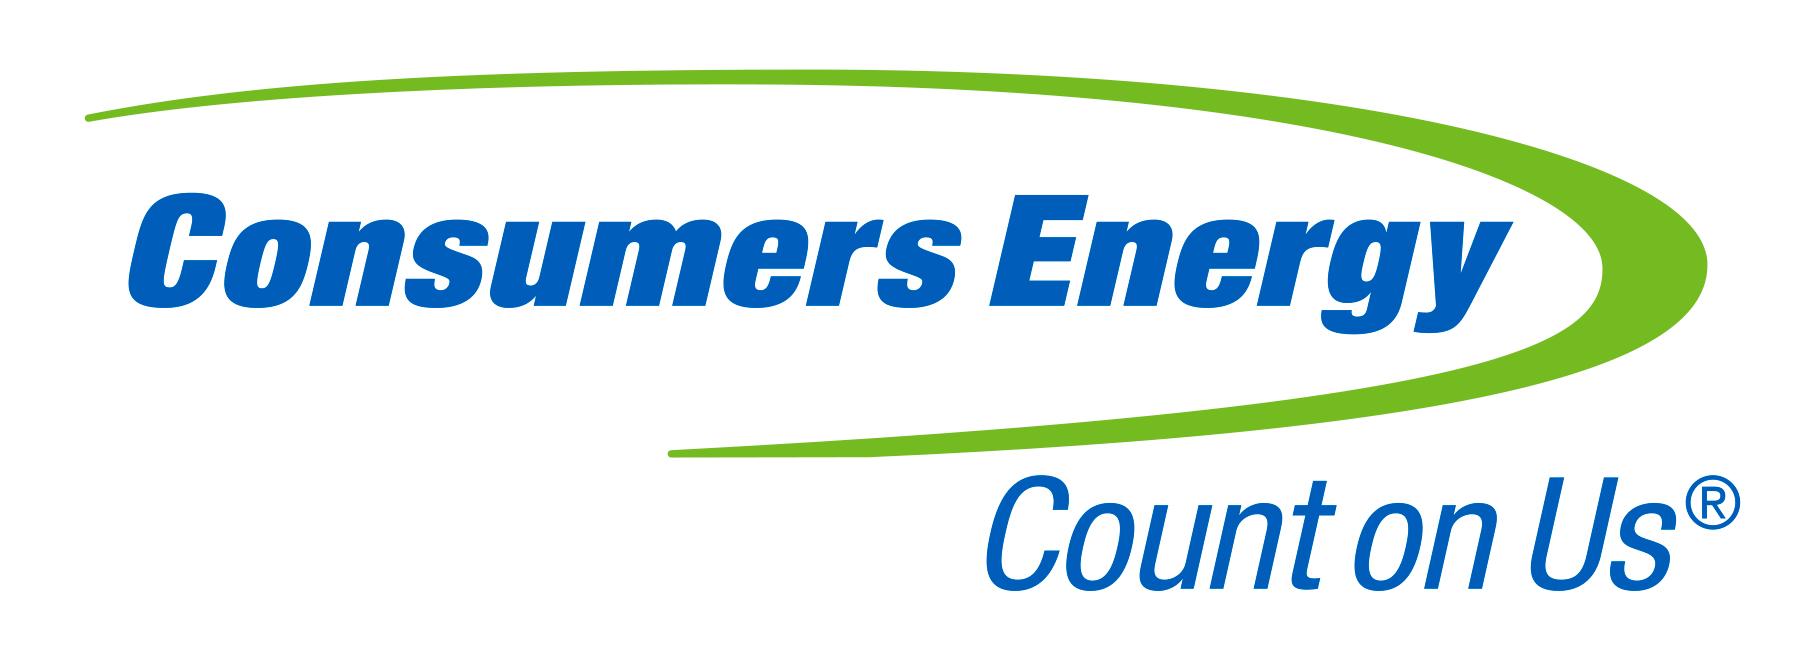 Consumers Energy - $250 Donation